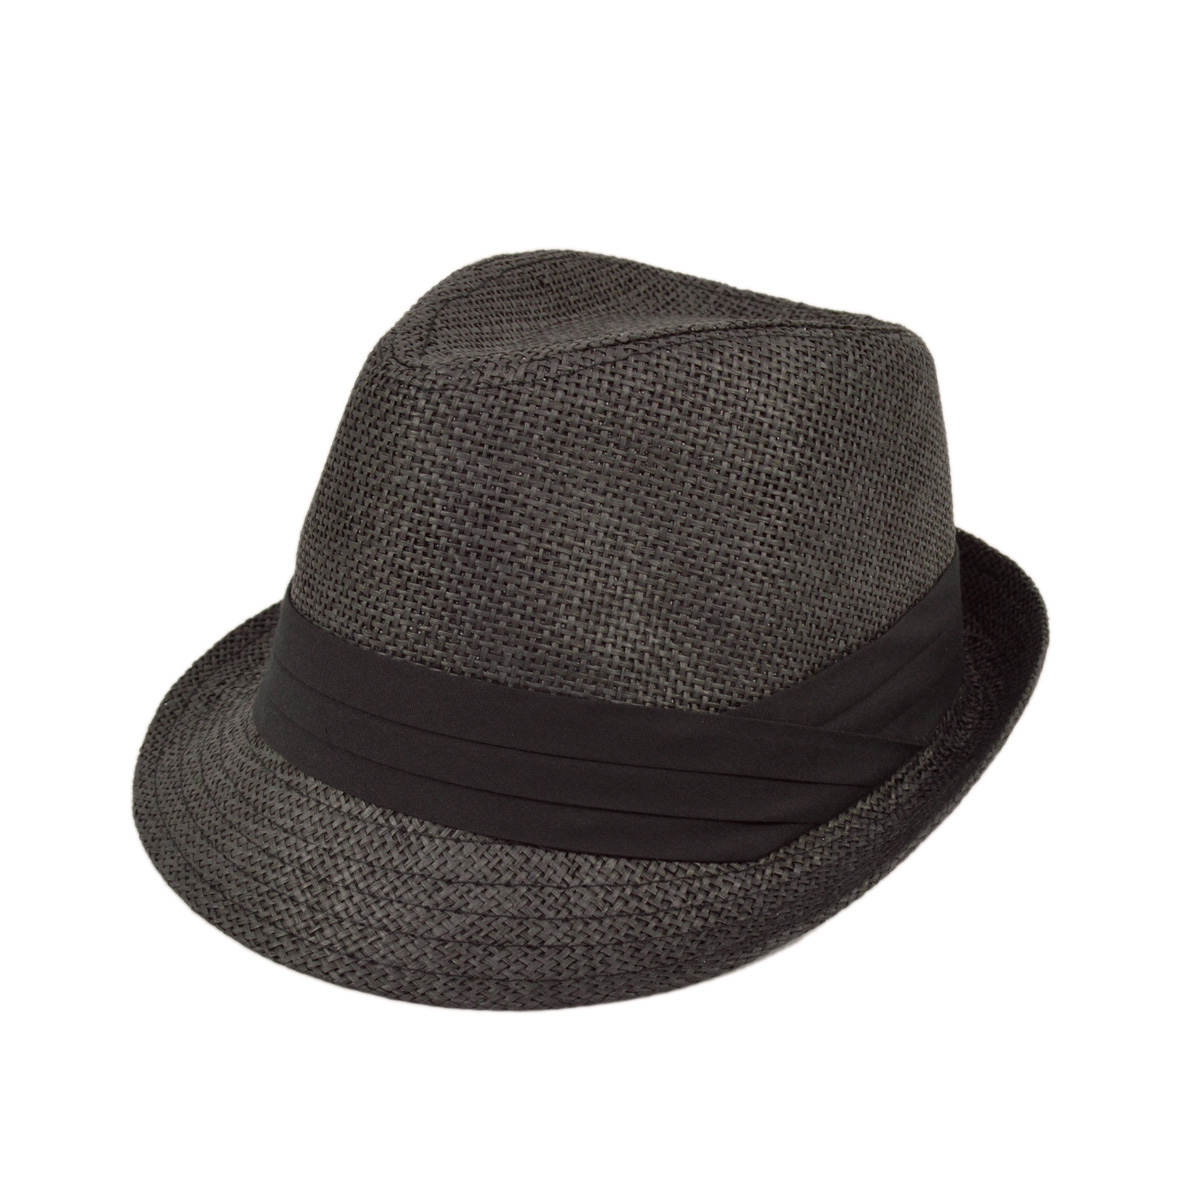 eca4ecd161 Unisex Classic Fedora Straw Hat with Black Cotton Band